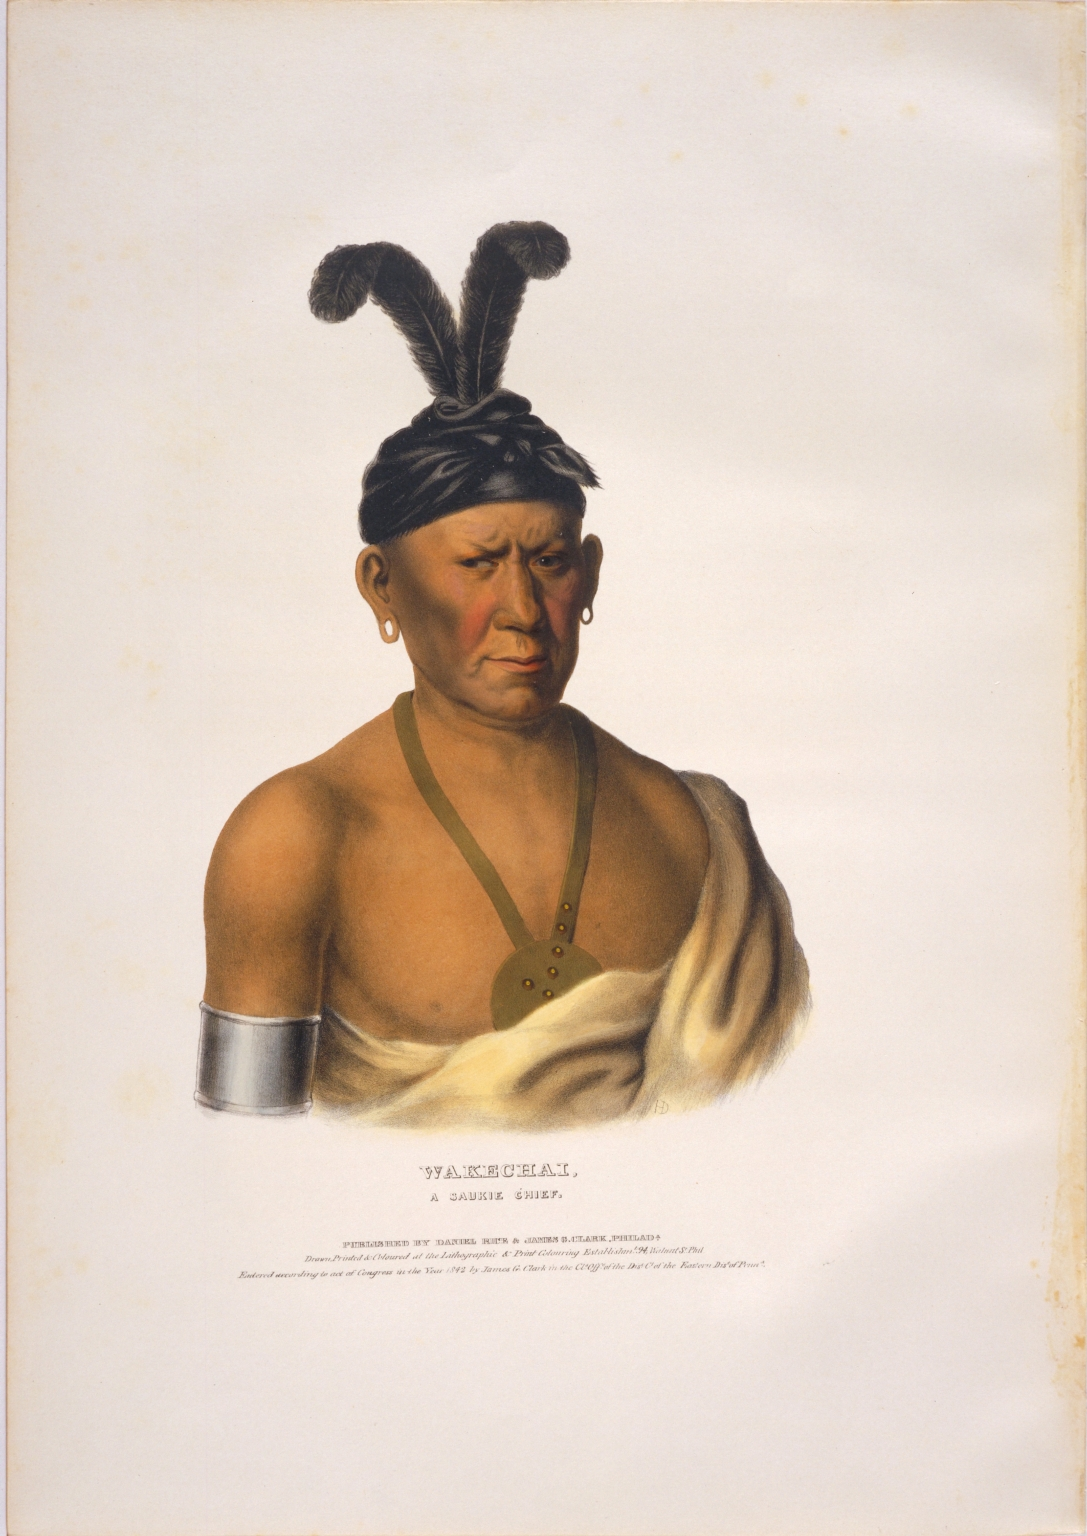 Wakechai, a Saukie chief